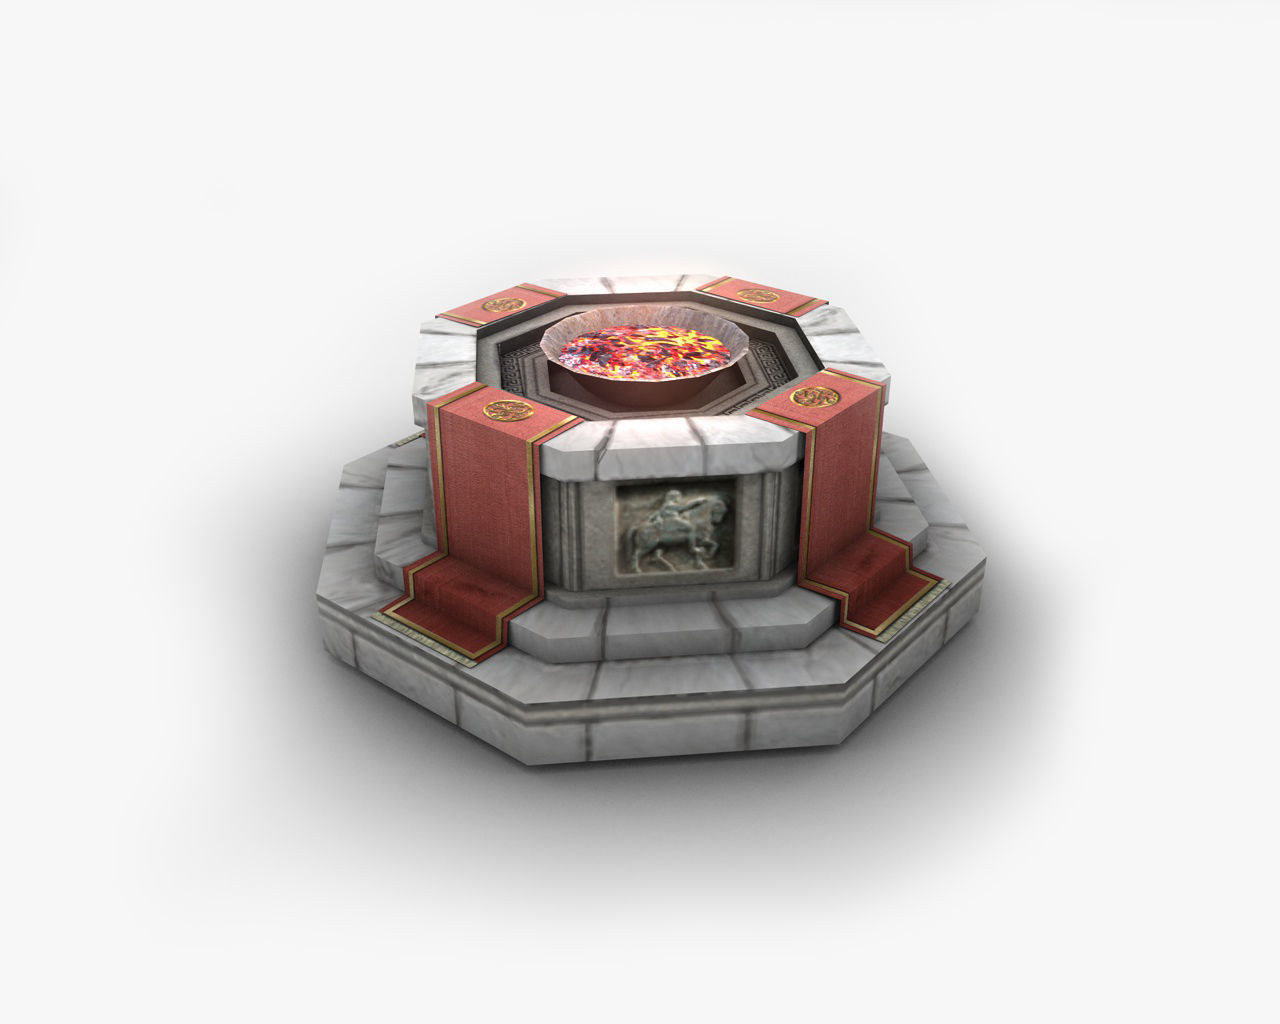 Shrine with fire pit brazier